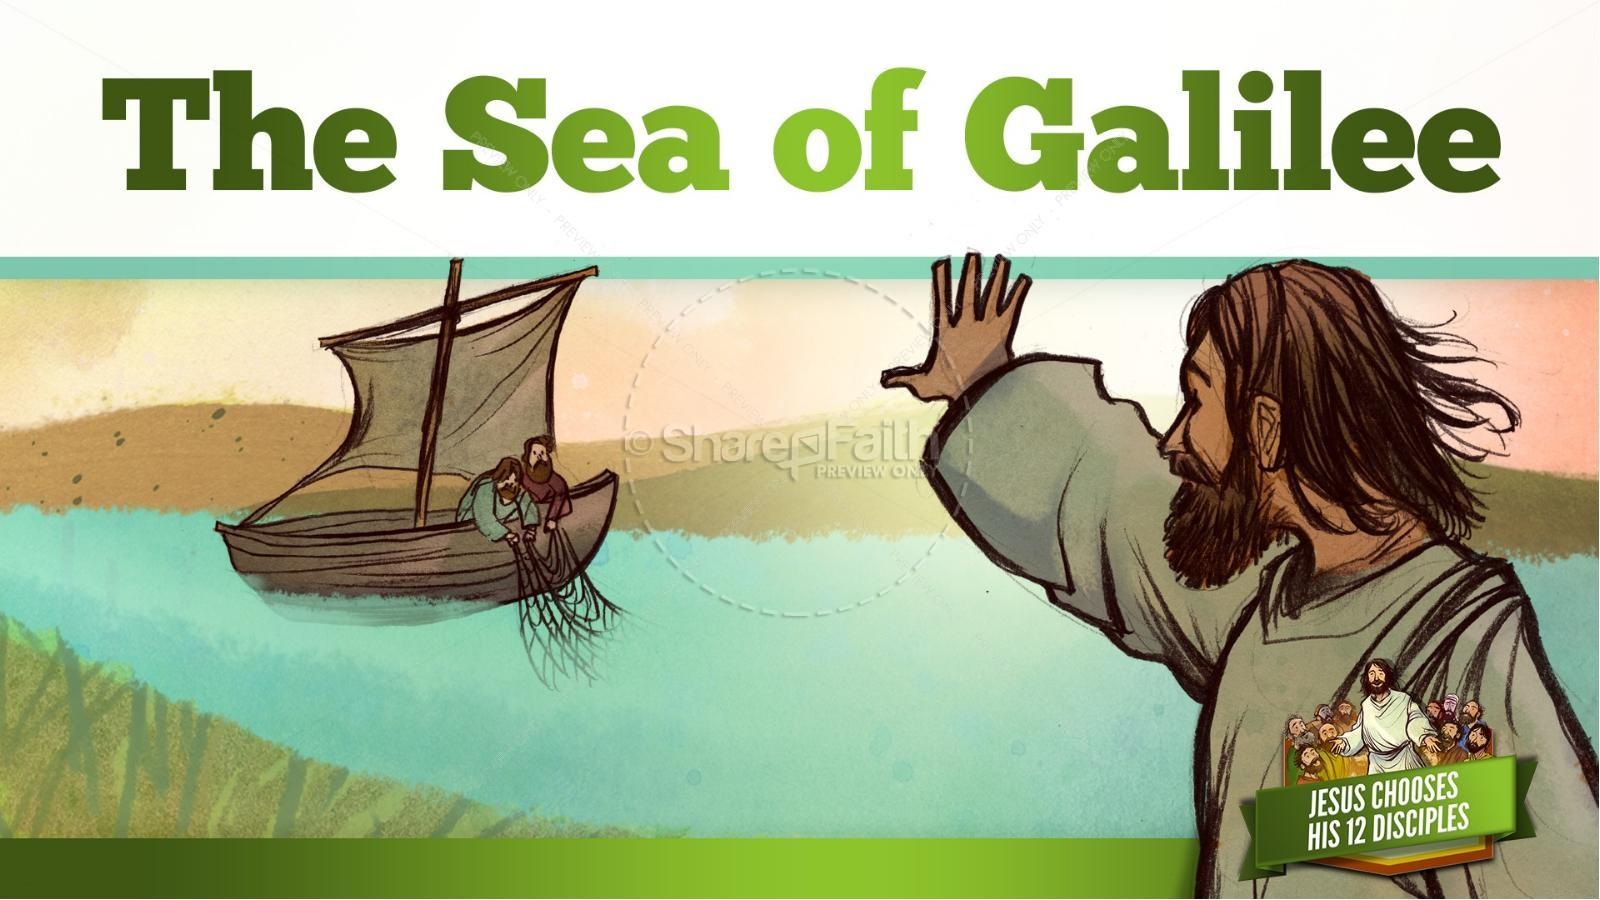 Jesus Chooses His 12 Disciples Kids Bible Story | slide 11